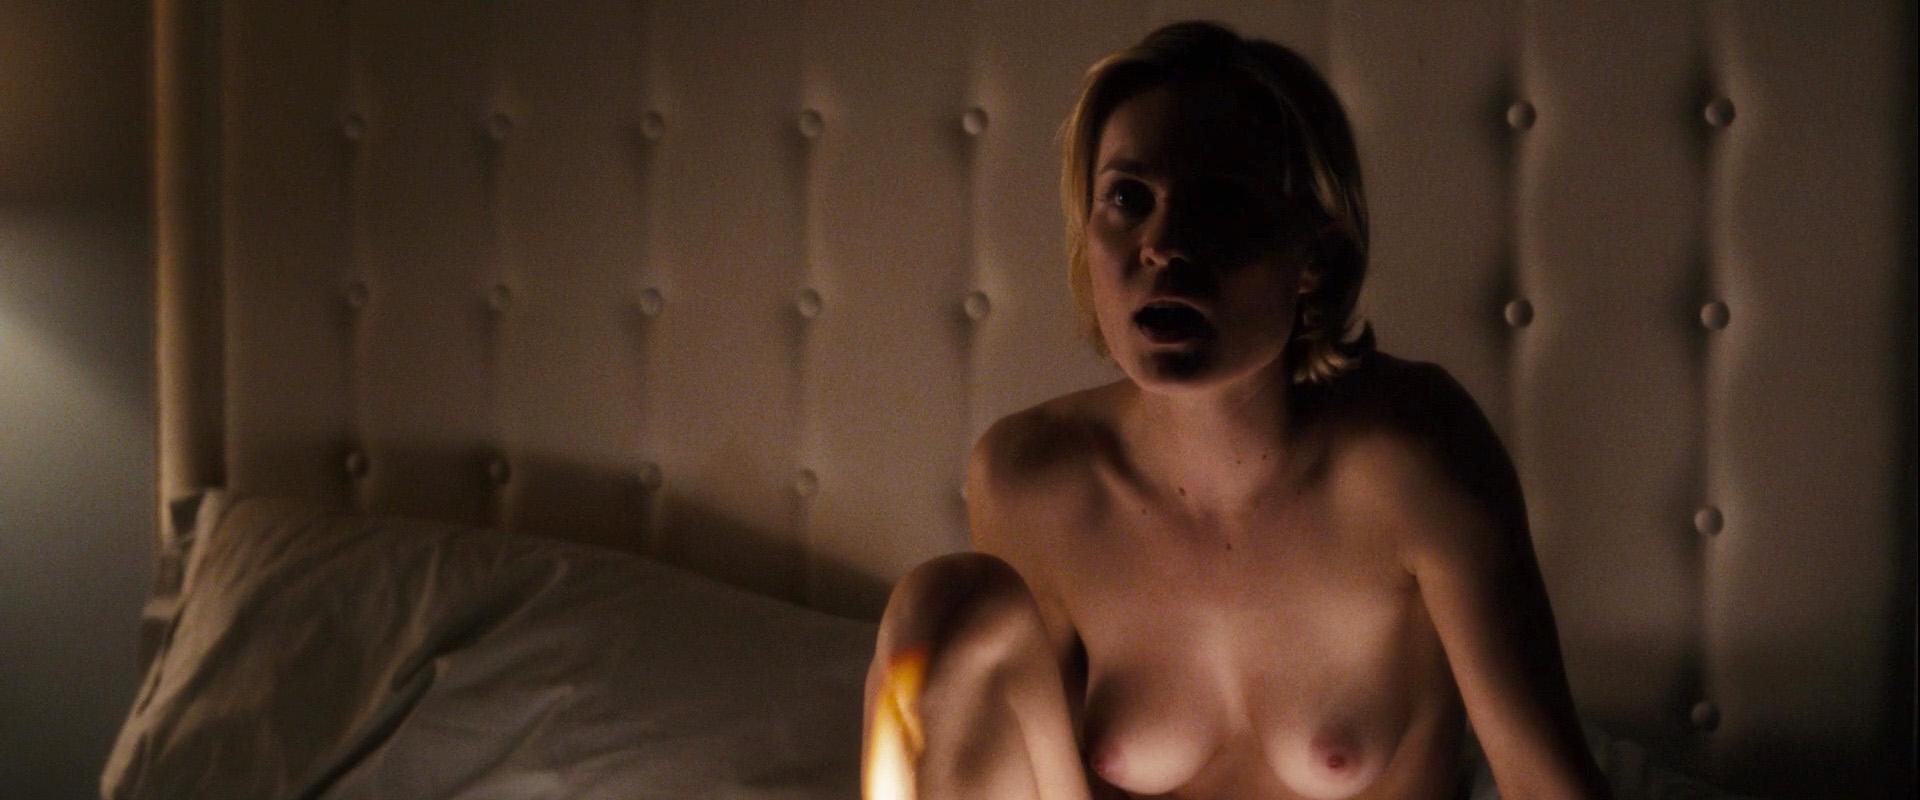 pics Radha mitchell nude scene feast love movie